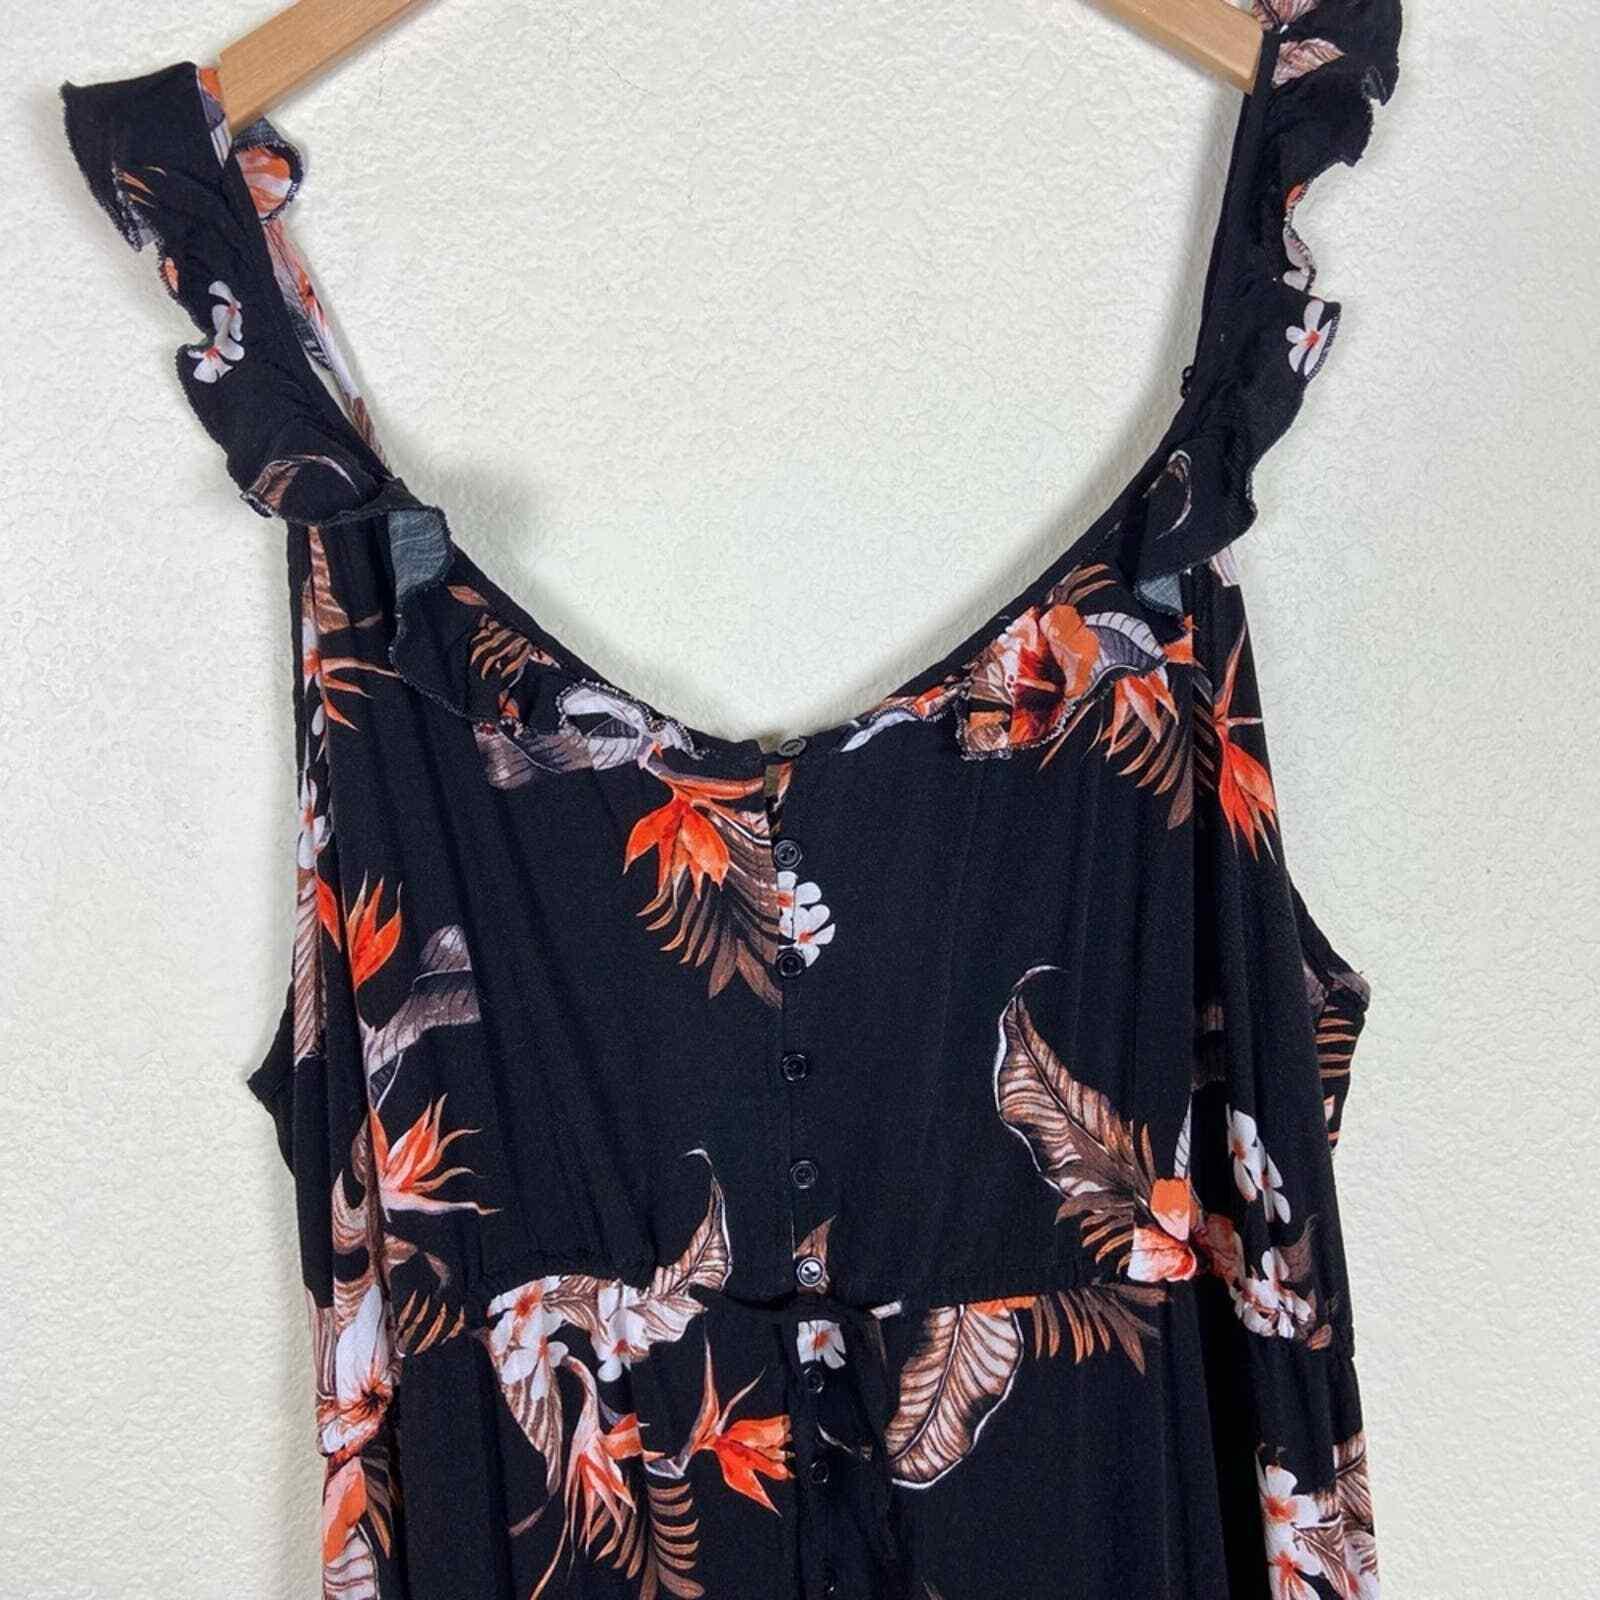 City Chic Seville Black Floral Swing Midi Dress - image 4